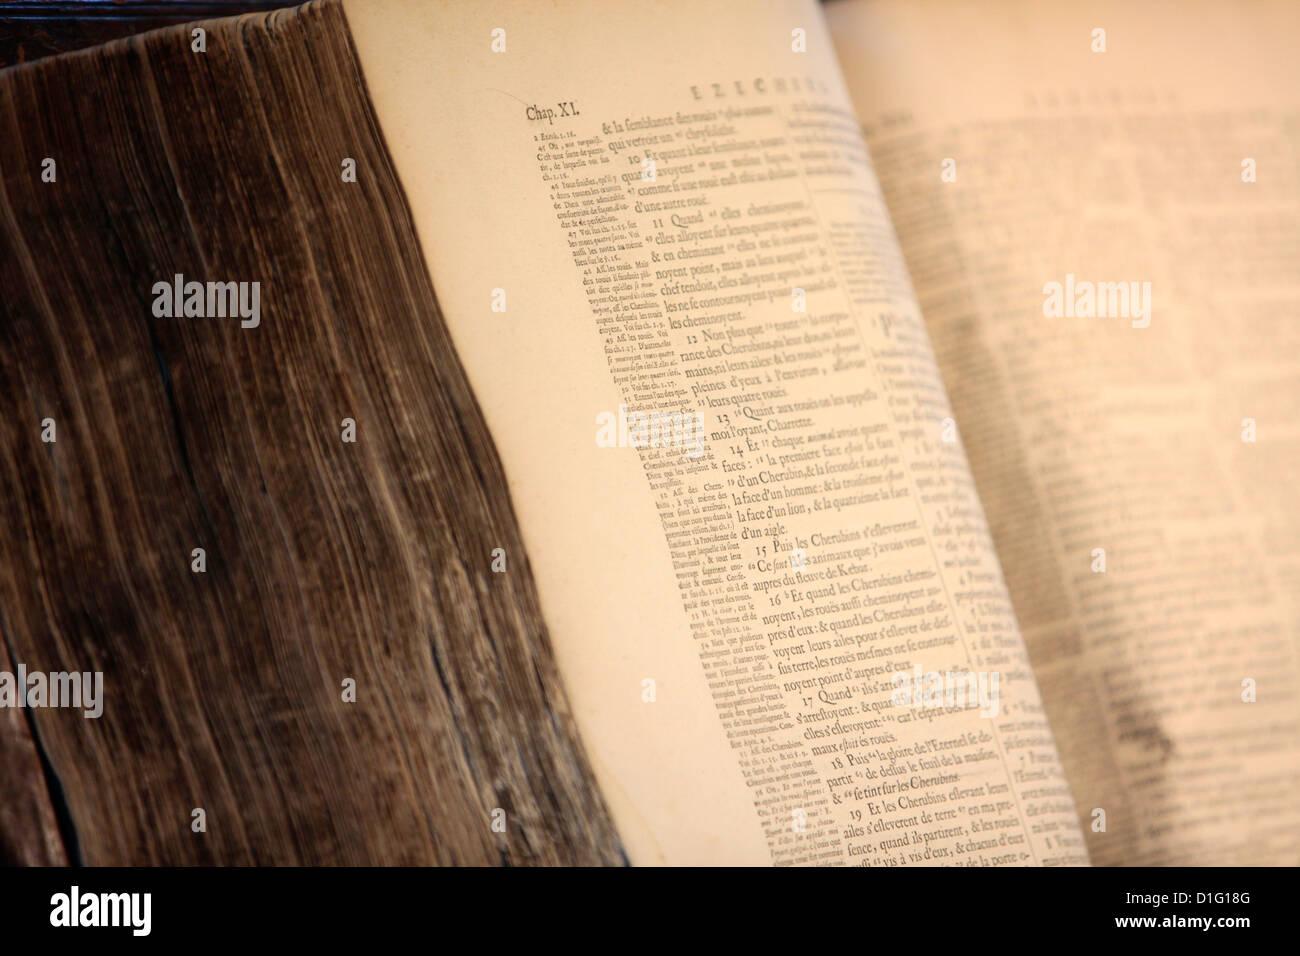 Old Bible, Paris, France, Europe - Stock Image